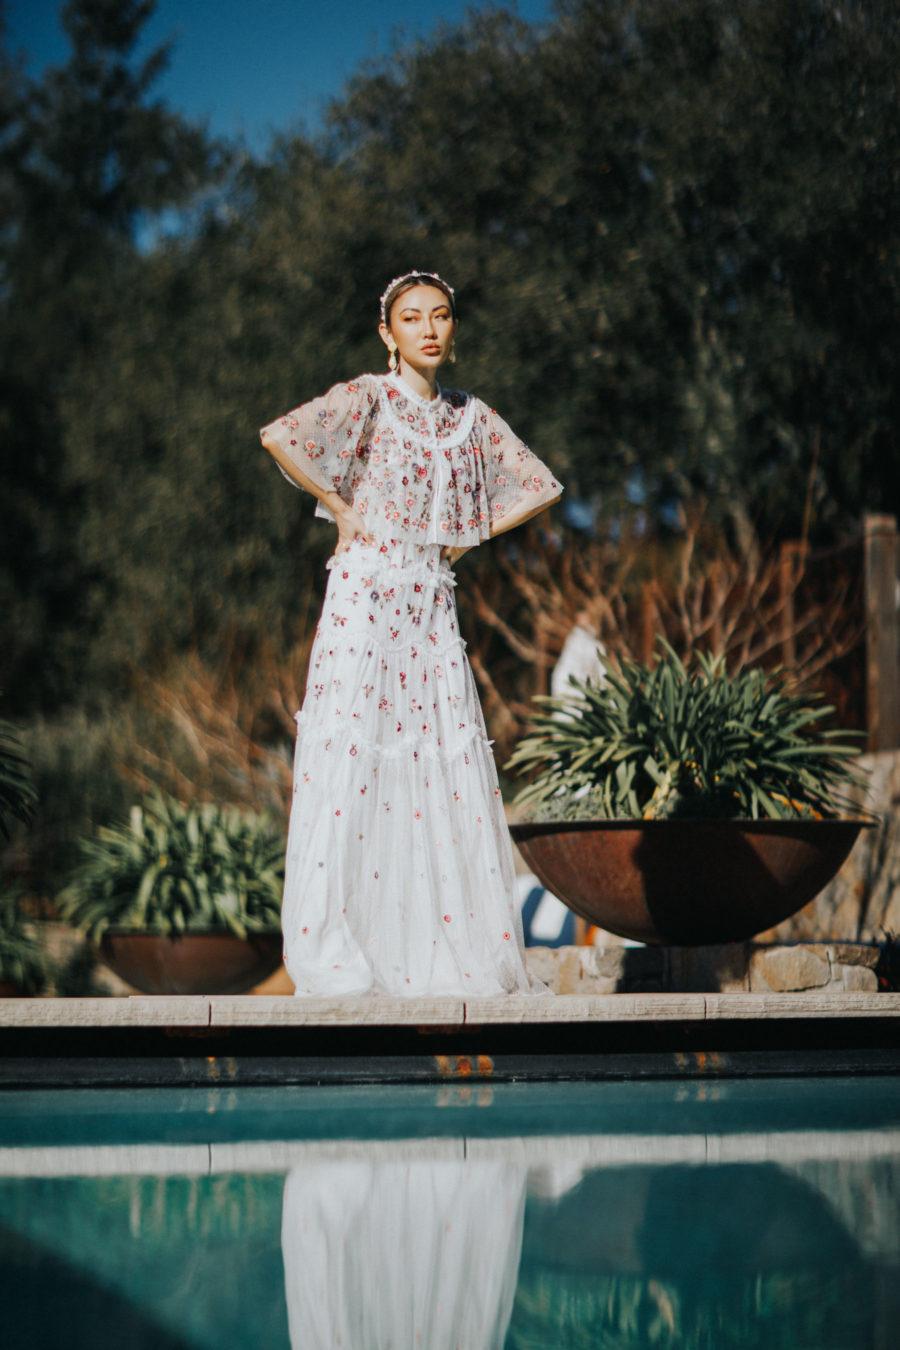 jessica wang wearing a needle & thread wedding dress // Jessica Wang - Notjessfashion.com